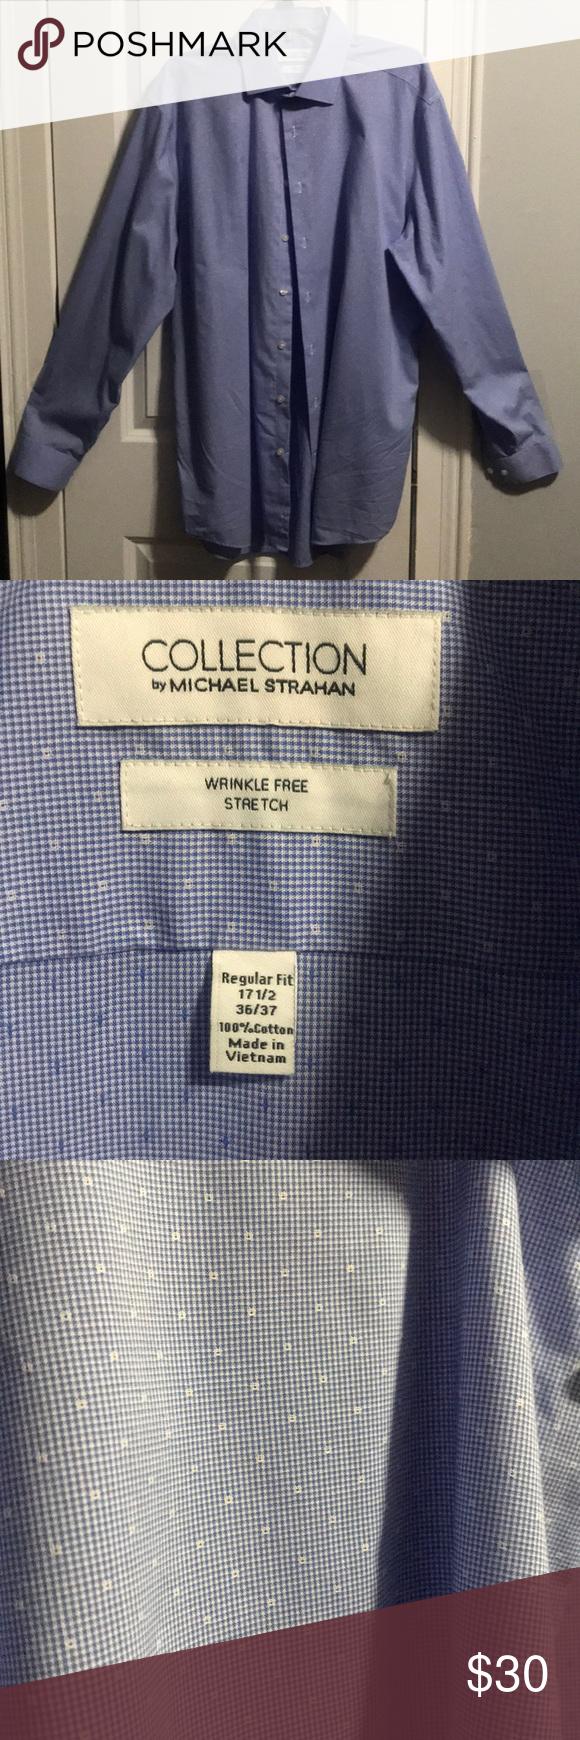 Michael Strahan Dress Shirt In 2018 My Posh Closet Shirt Dress